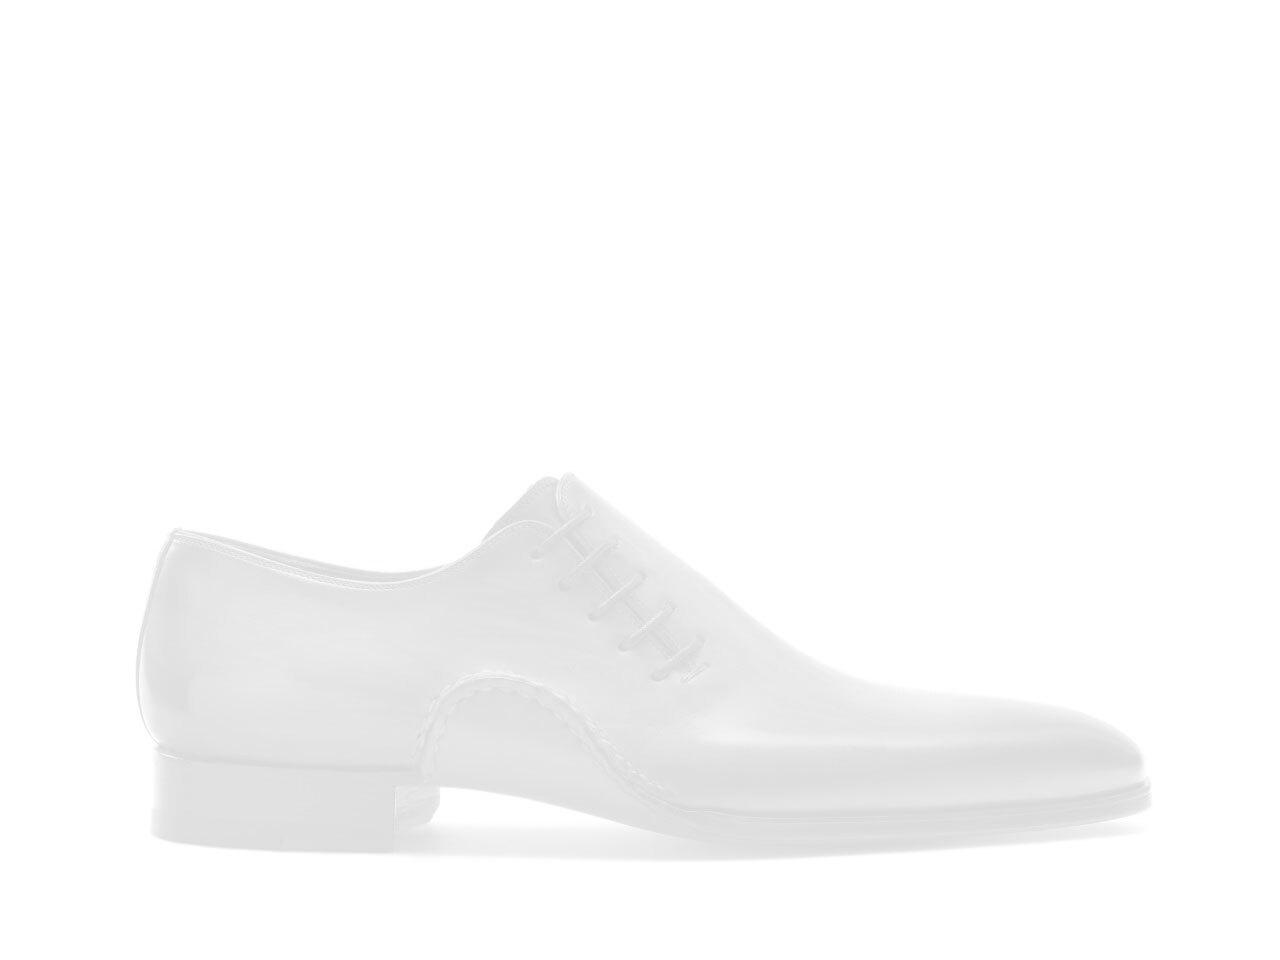 Side view of the Magnanni Hamilton Cuero Men's Oxford Shoes